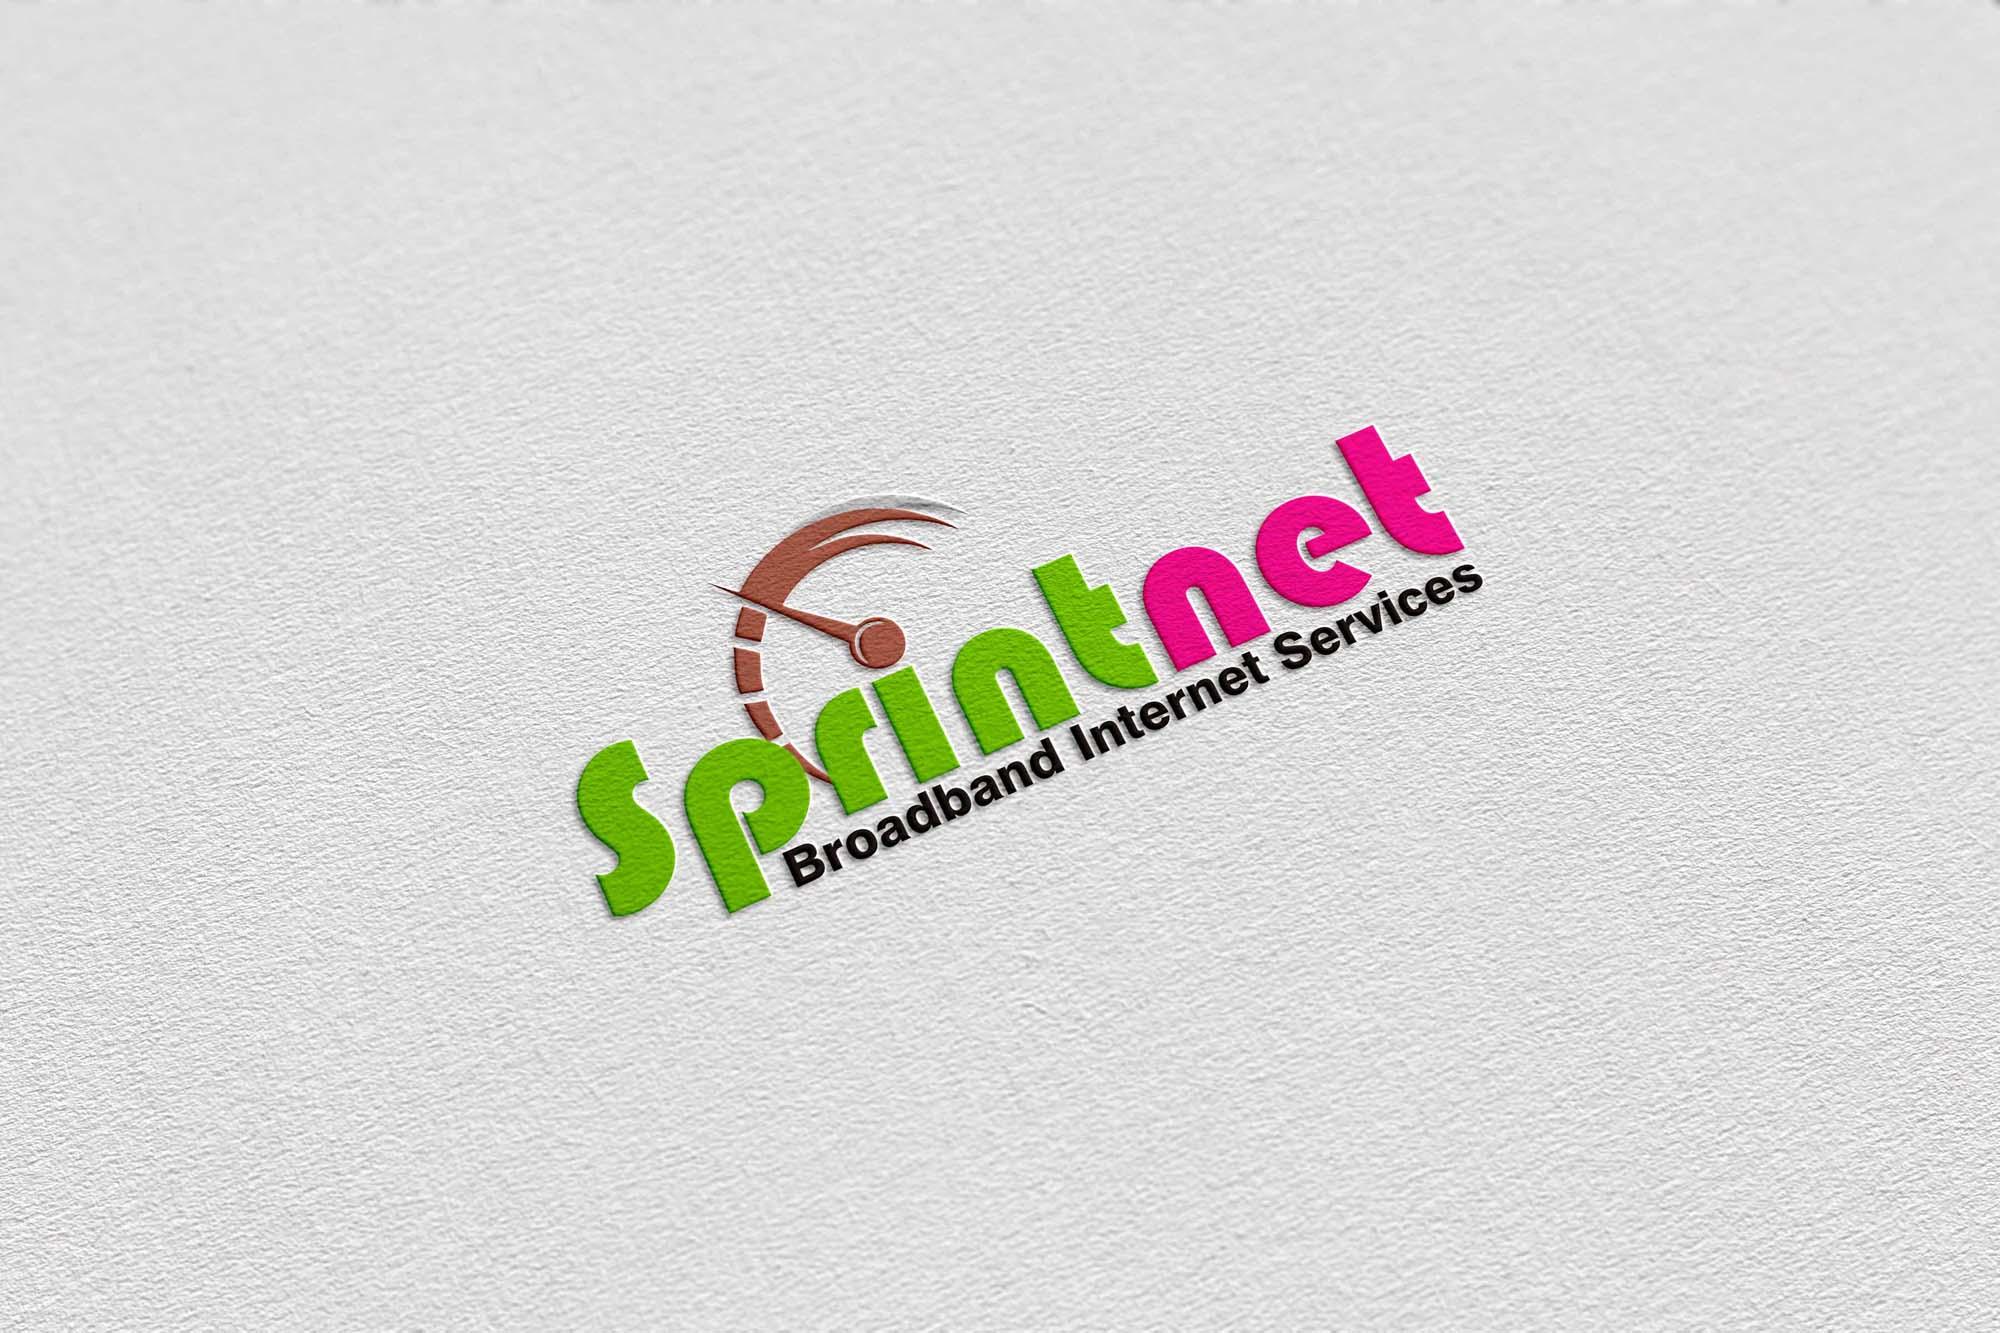 Sprintnet